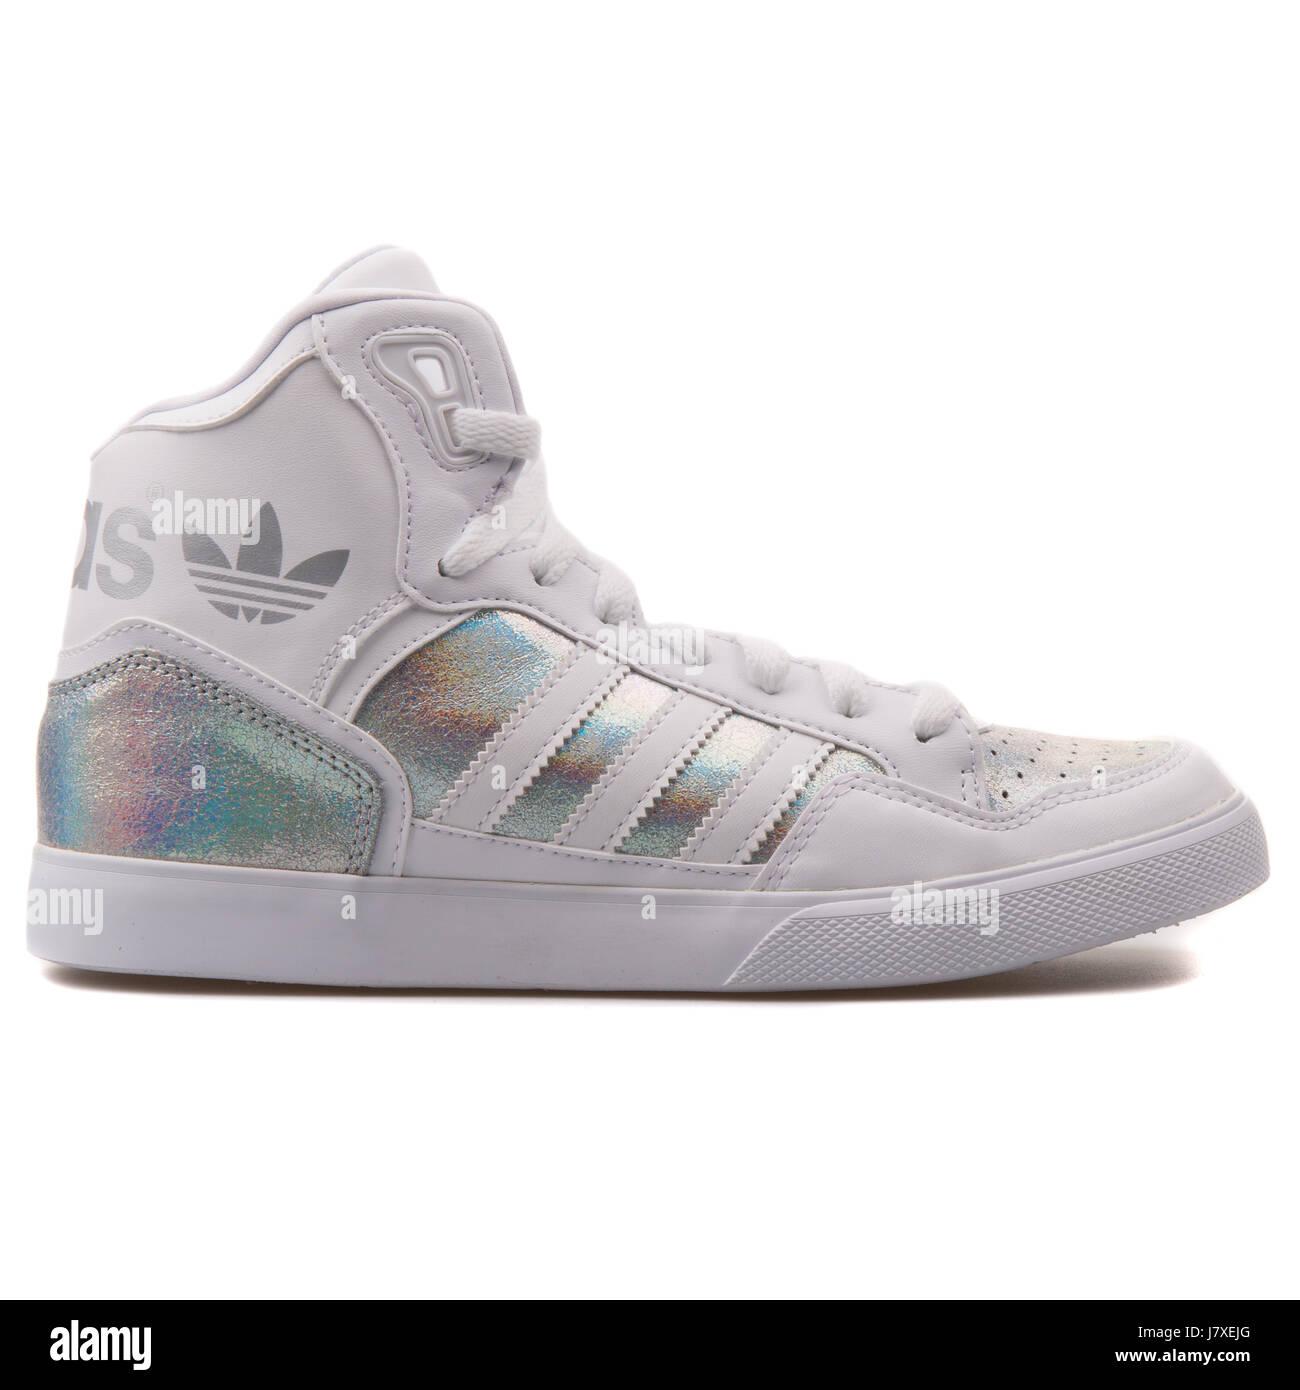 Adidas extaball W mujer blanco iridiscente con plata metálica